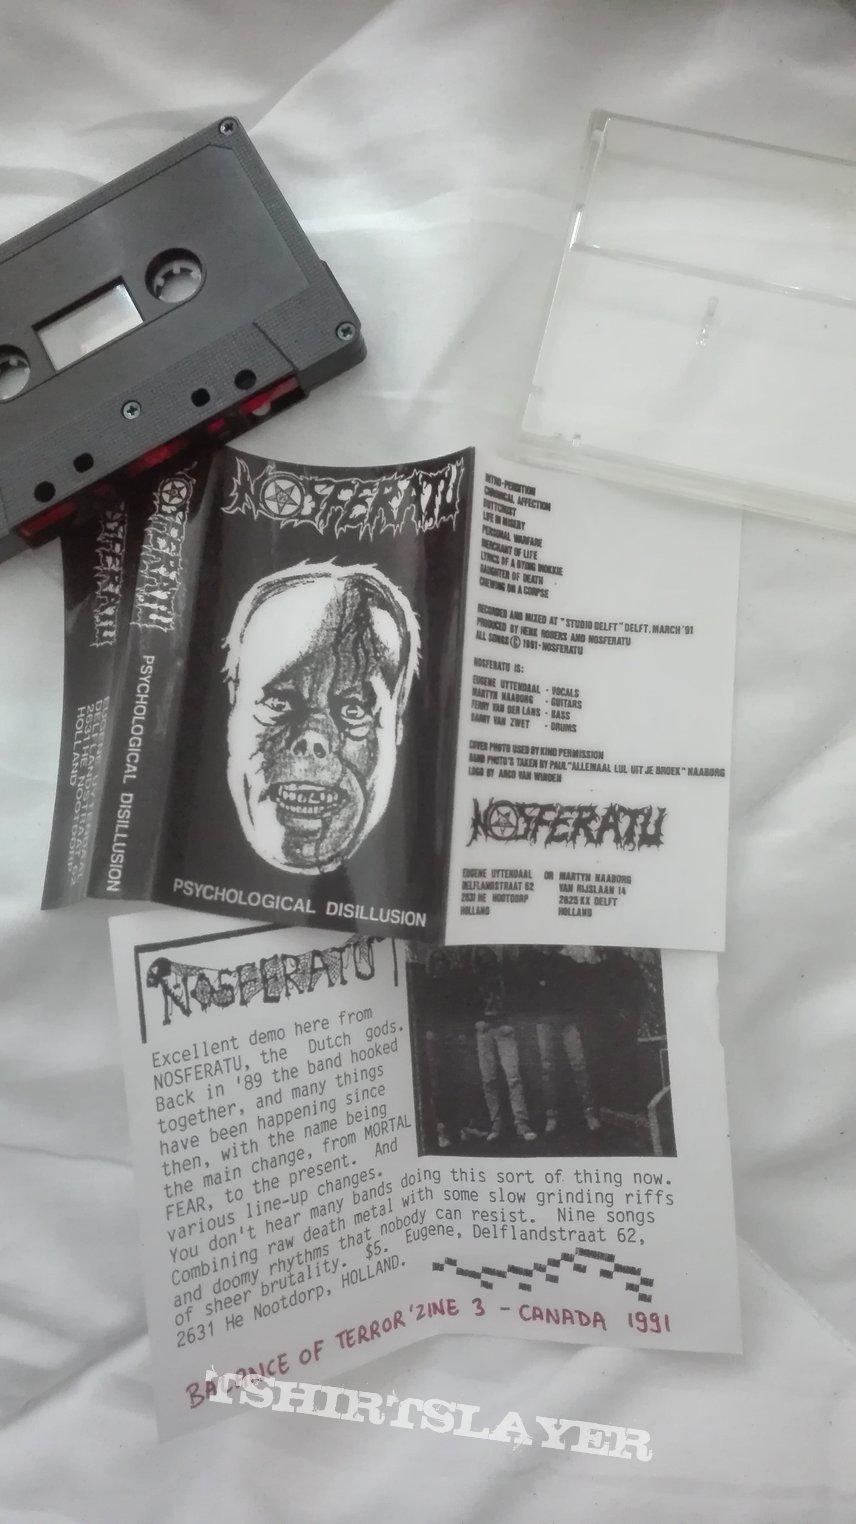 original Nosferatu- Psychological disillusion demo